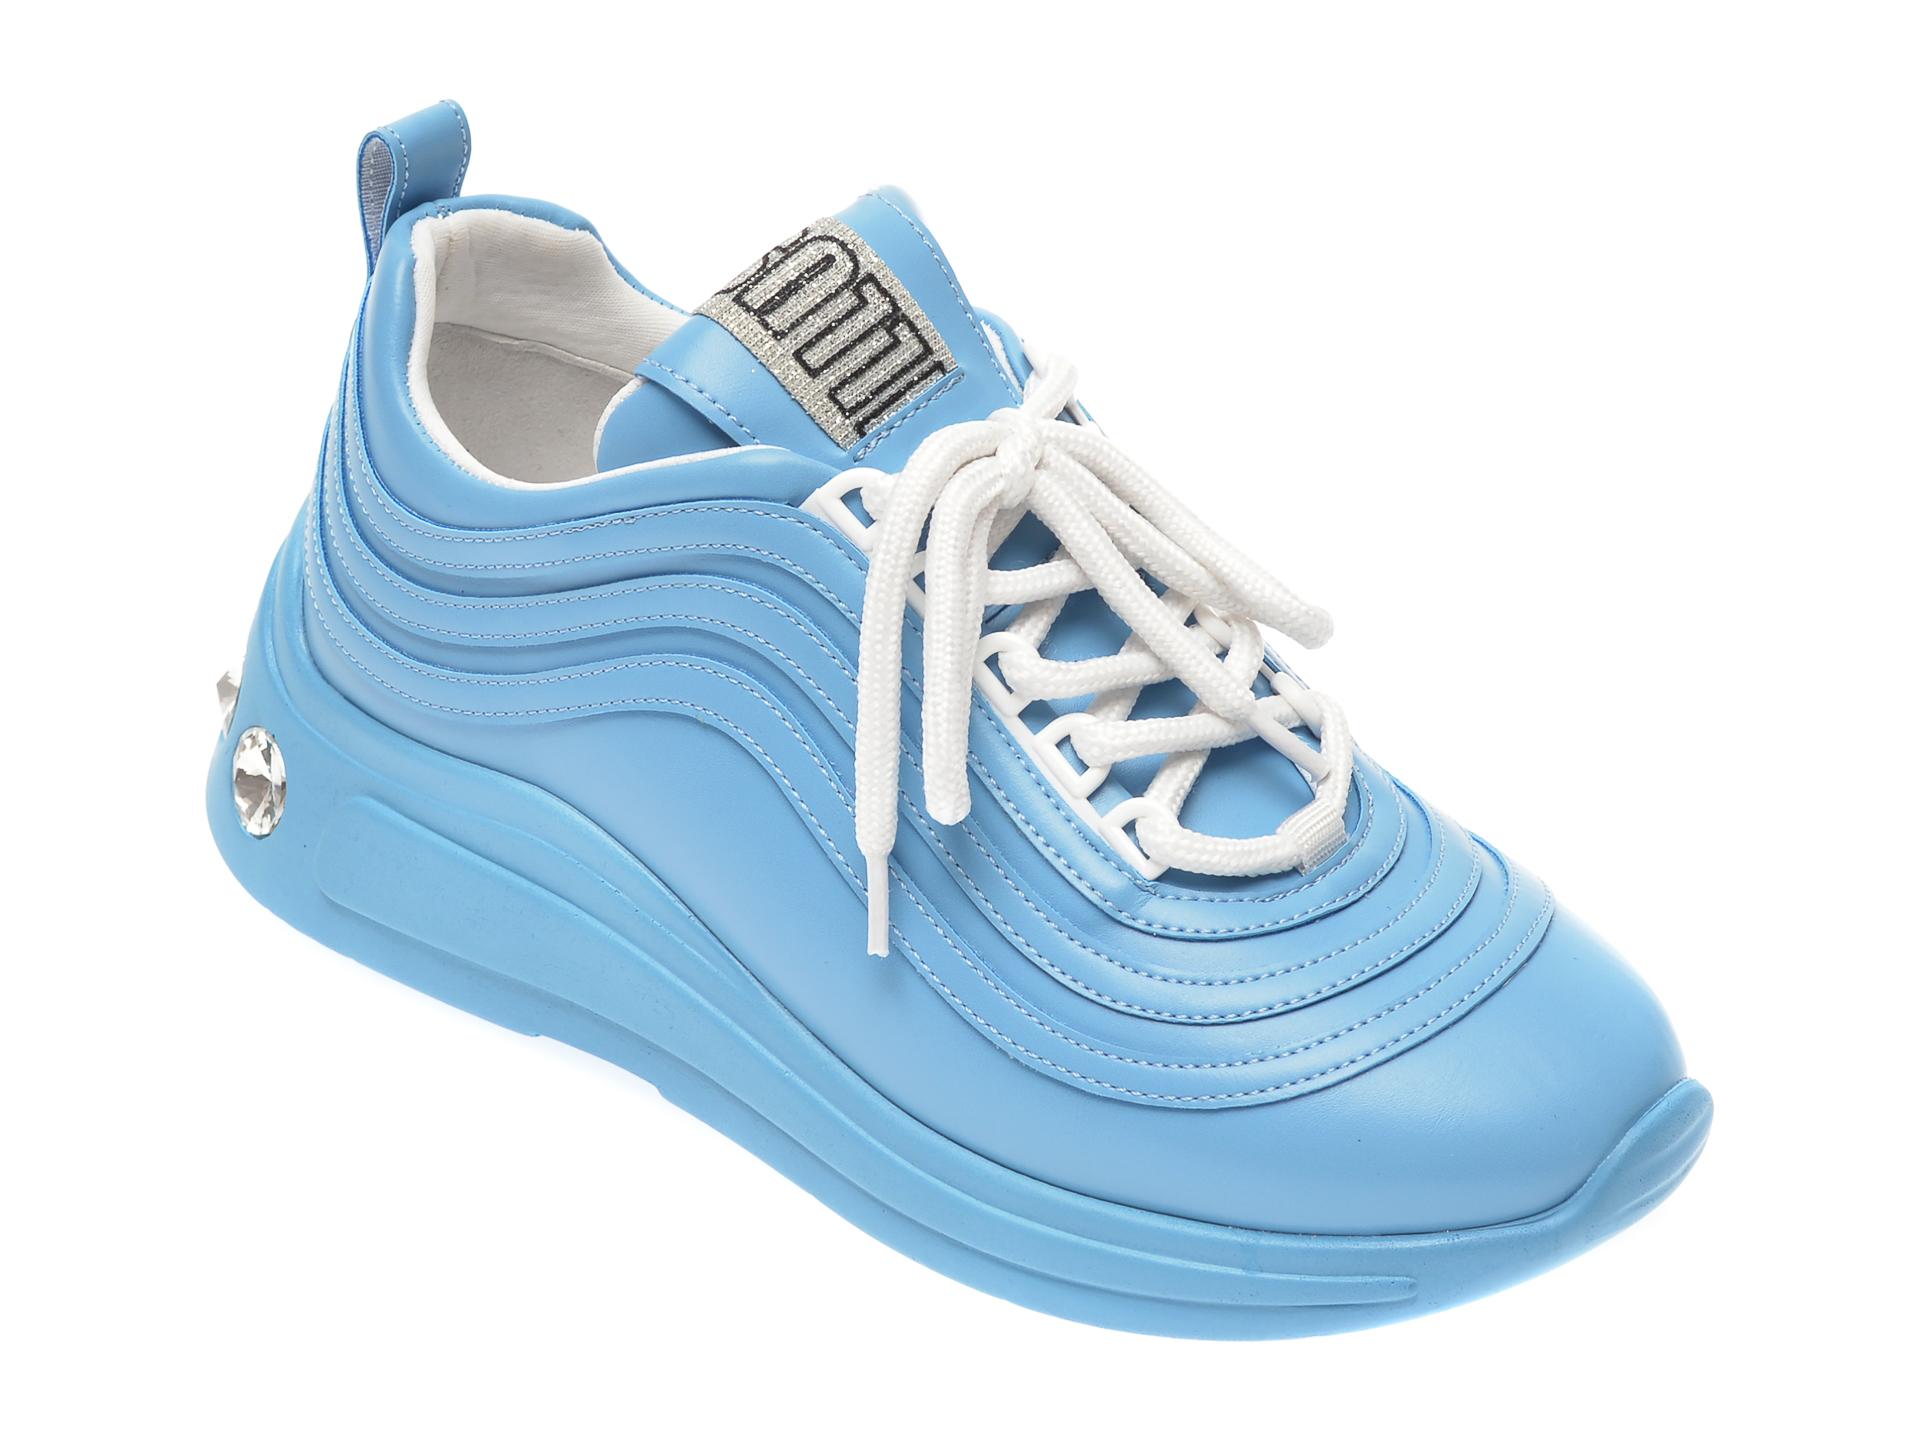 Pantofi sport GRYXX albastri, P43, din piele ecologica imagine